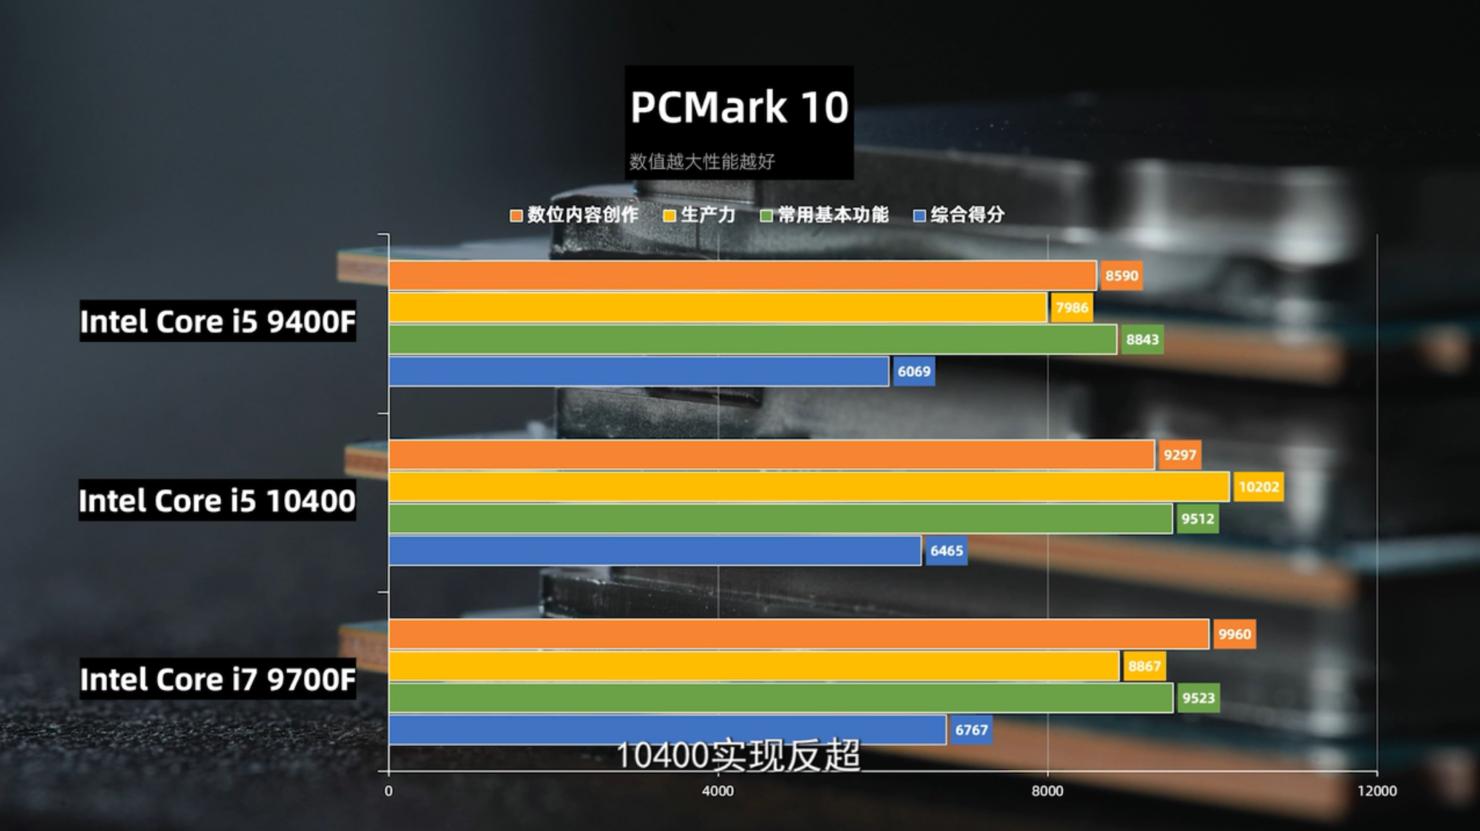 intel-core-i5-10400-comet-lake-s-6-core-desktop-cpu_pcmark-10